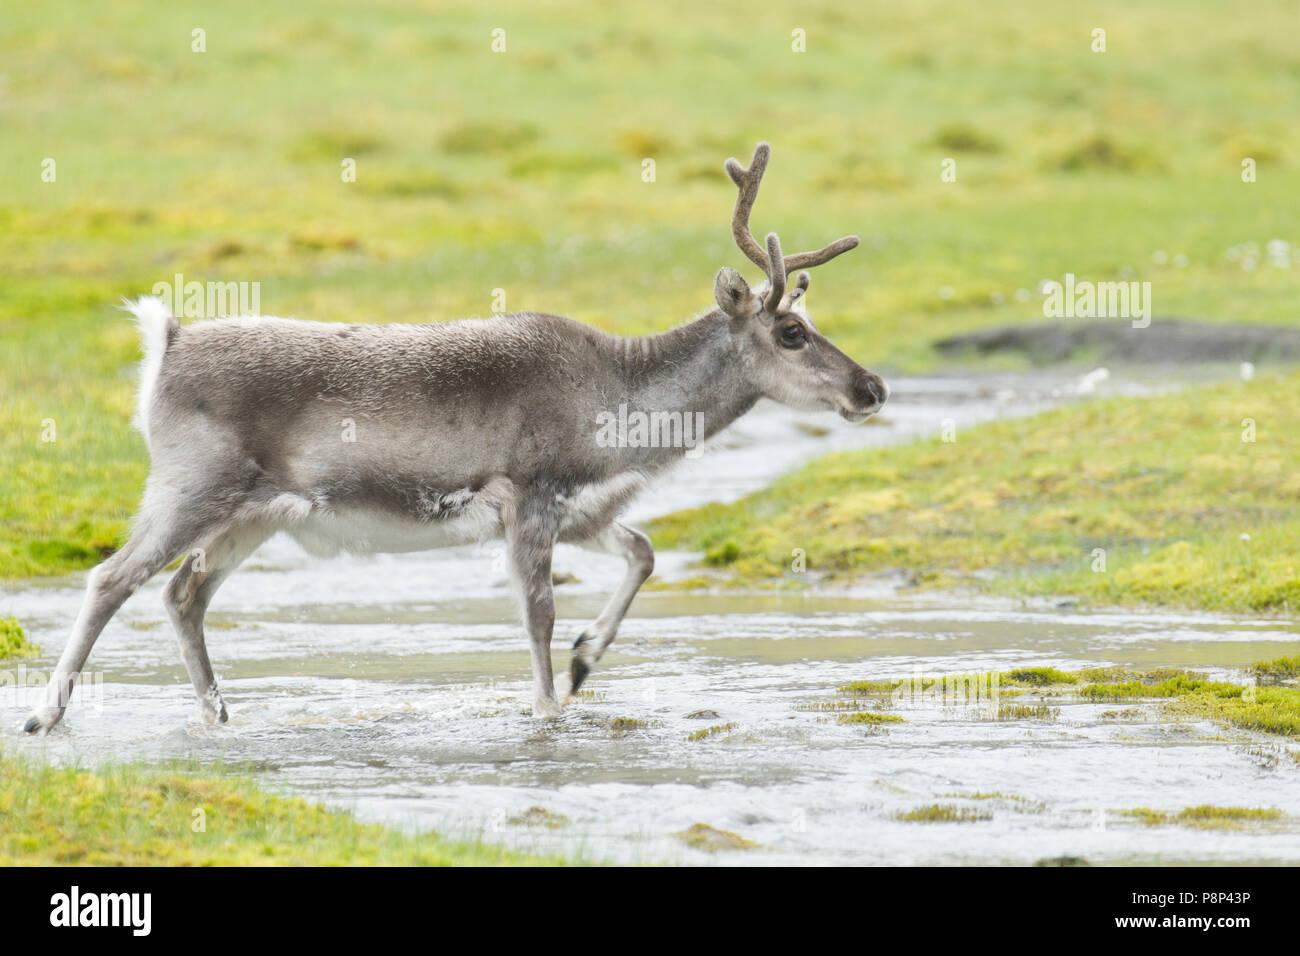 A Spitsbergen Reindeer crossing a tundra stream. - Stock Image